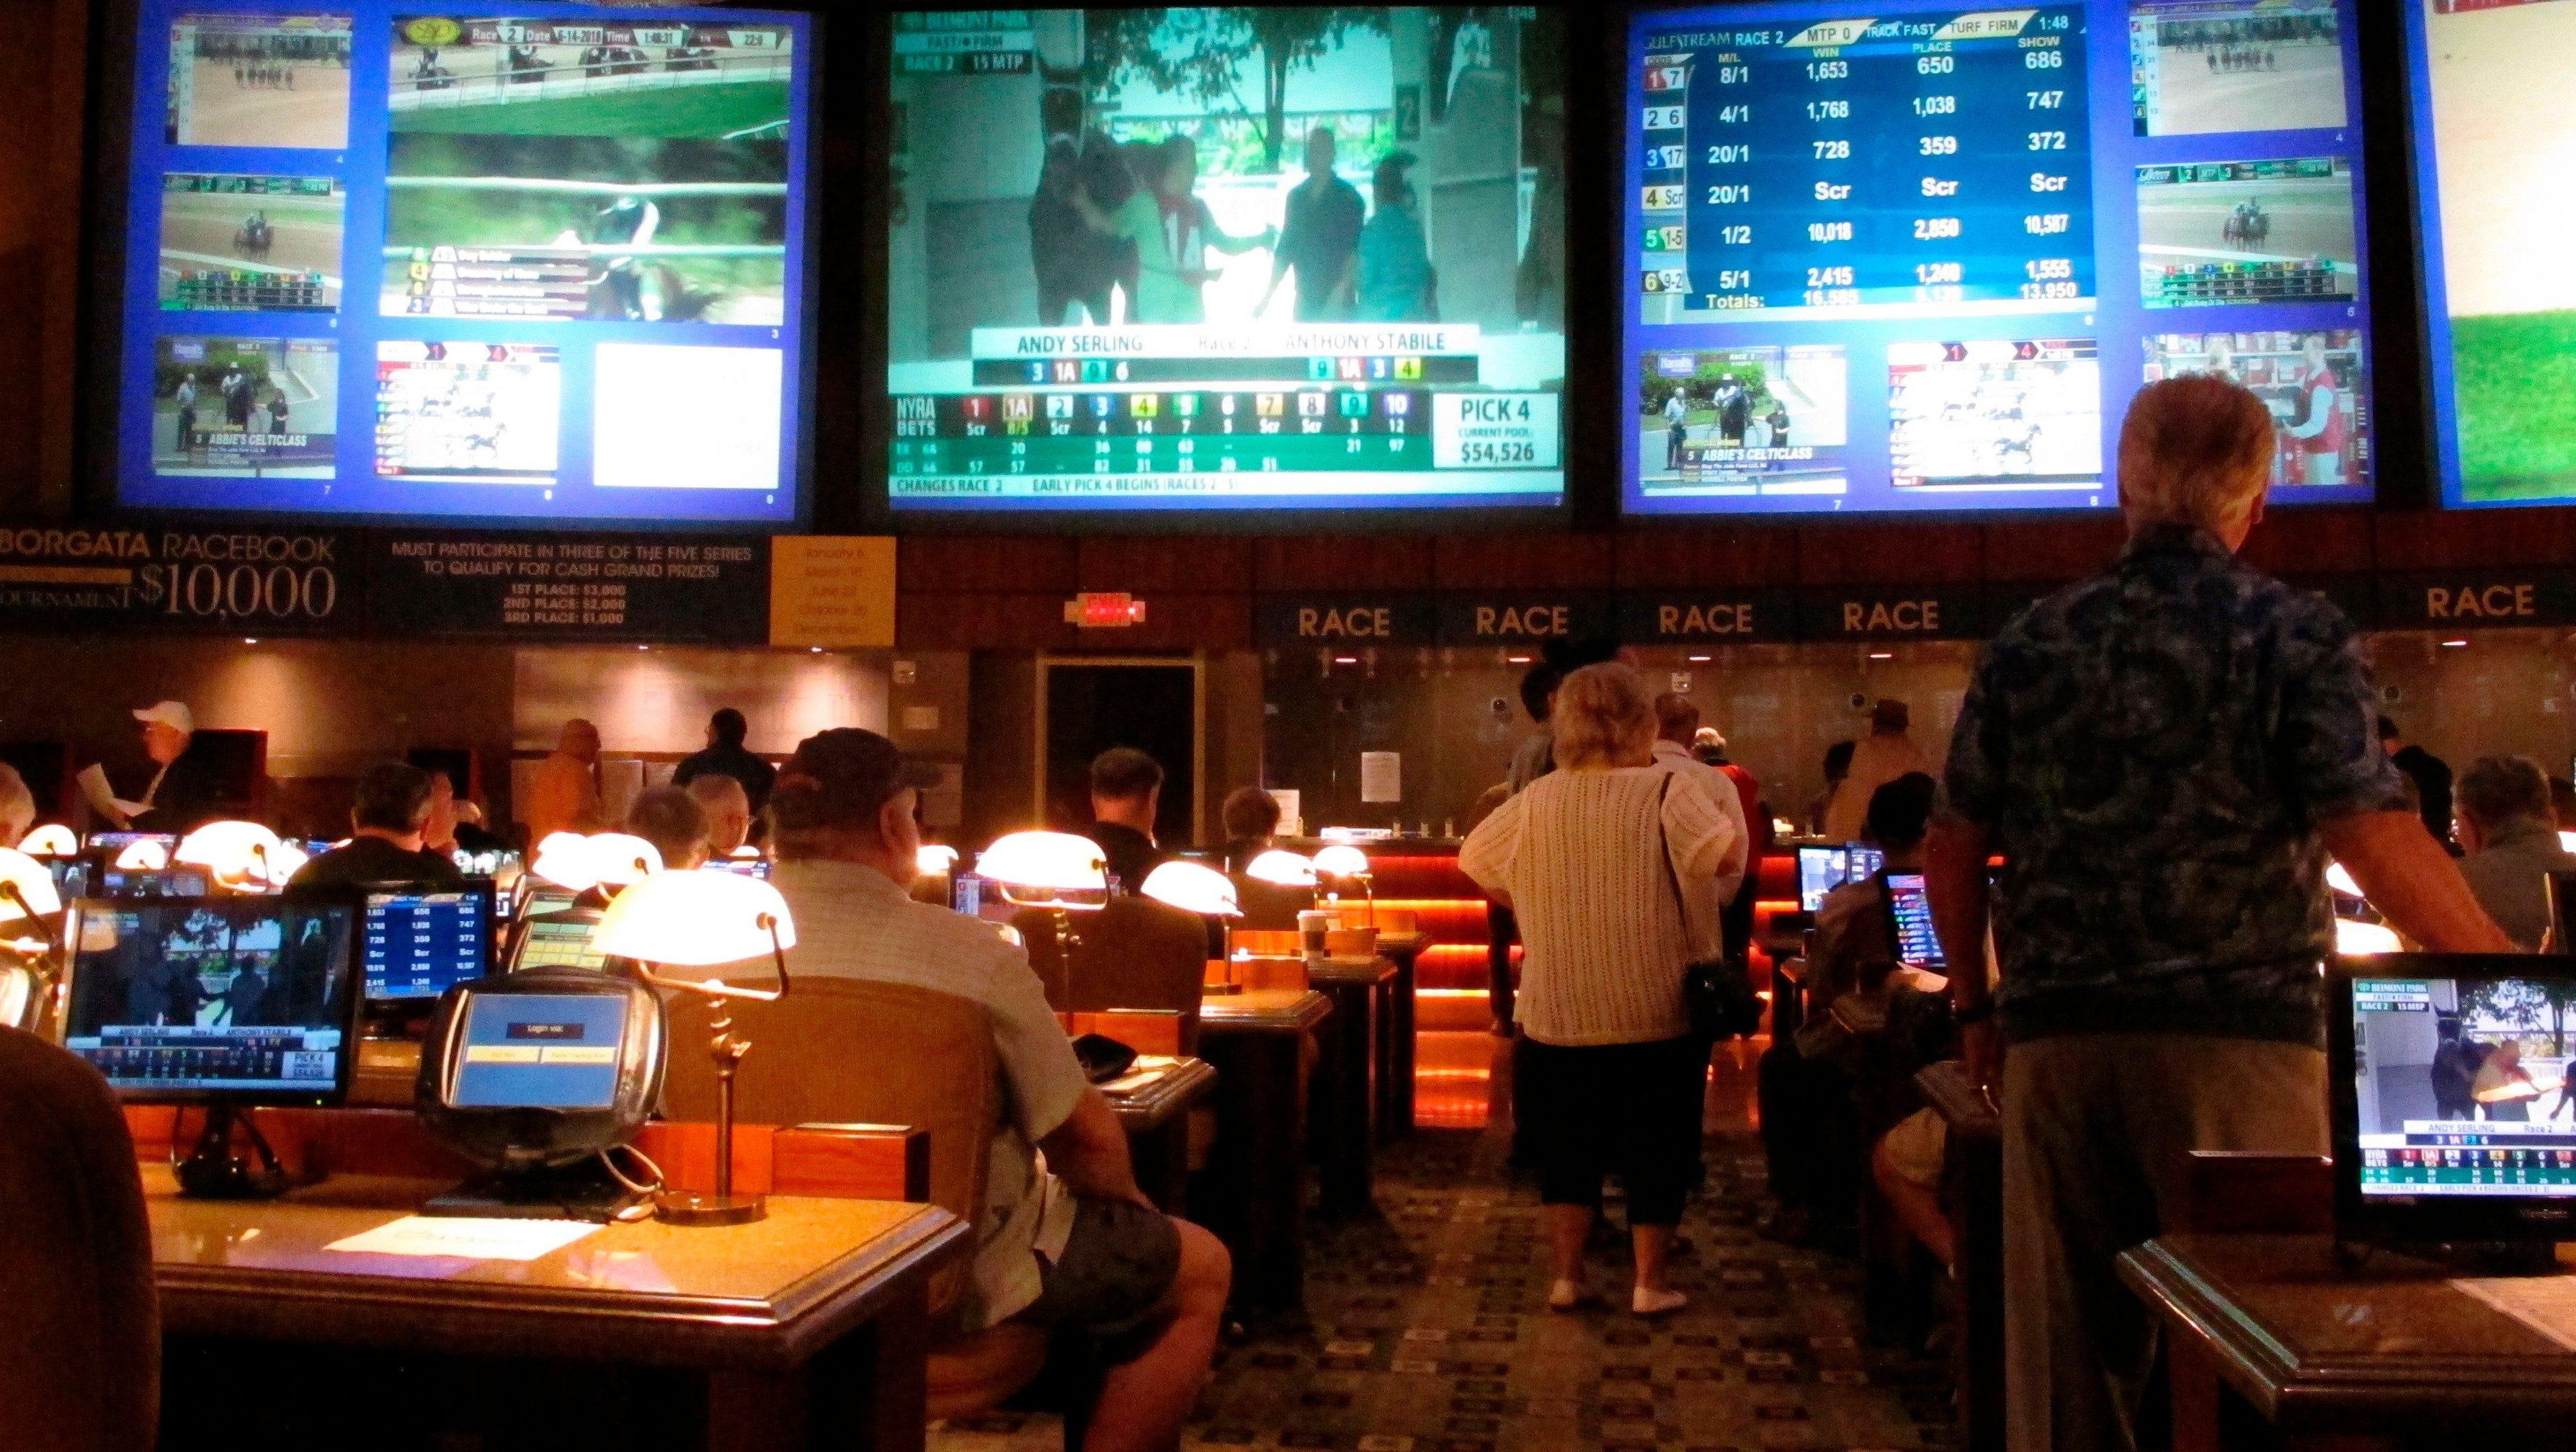 Daftar nama poker online indonesia